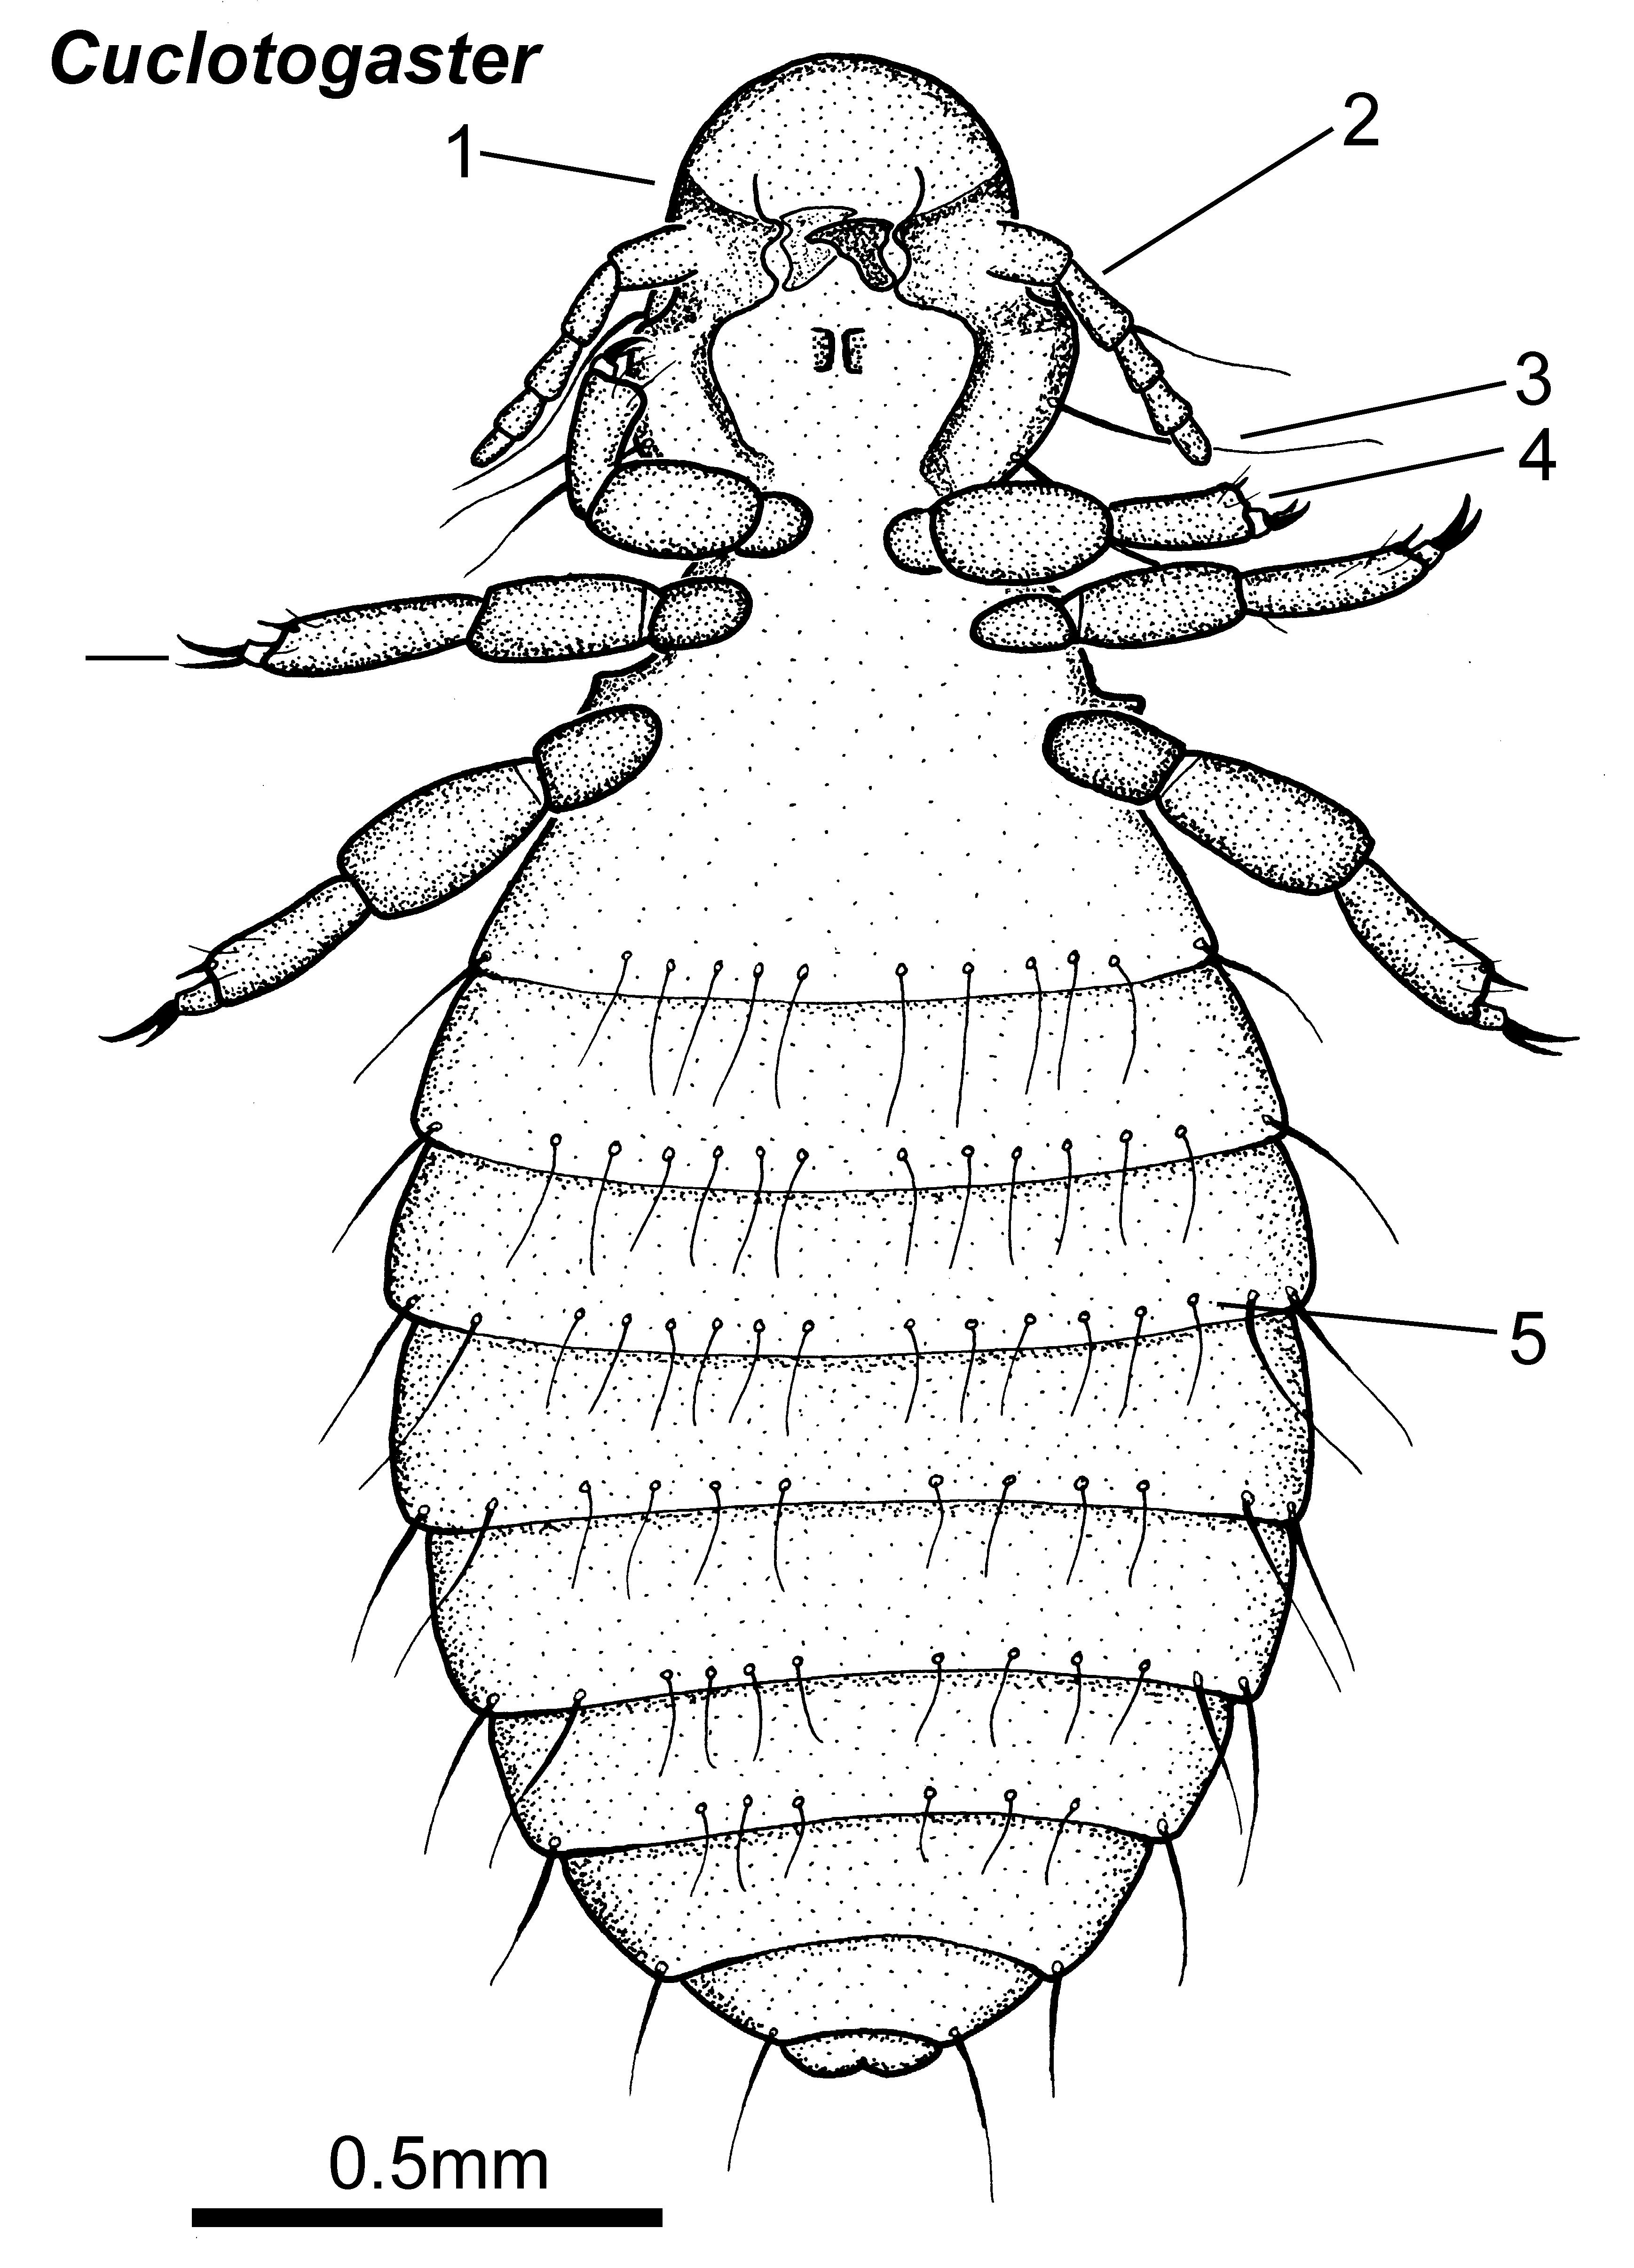 Acarologiste, CC BY-SA 4.0 <https://creativecommons.org/licenses/by-sa/4.0>, via Wikimedia Commons